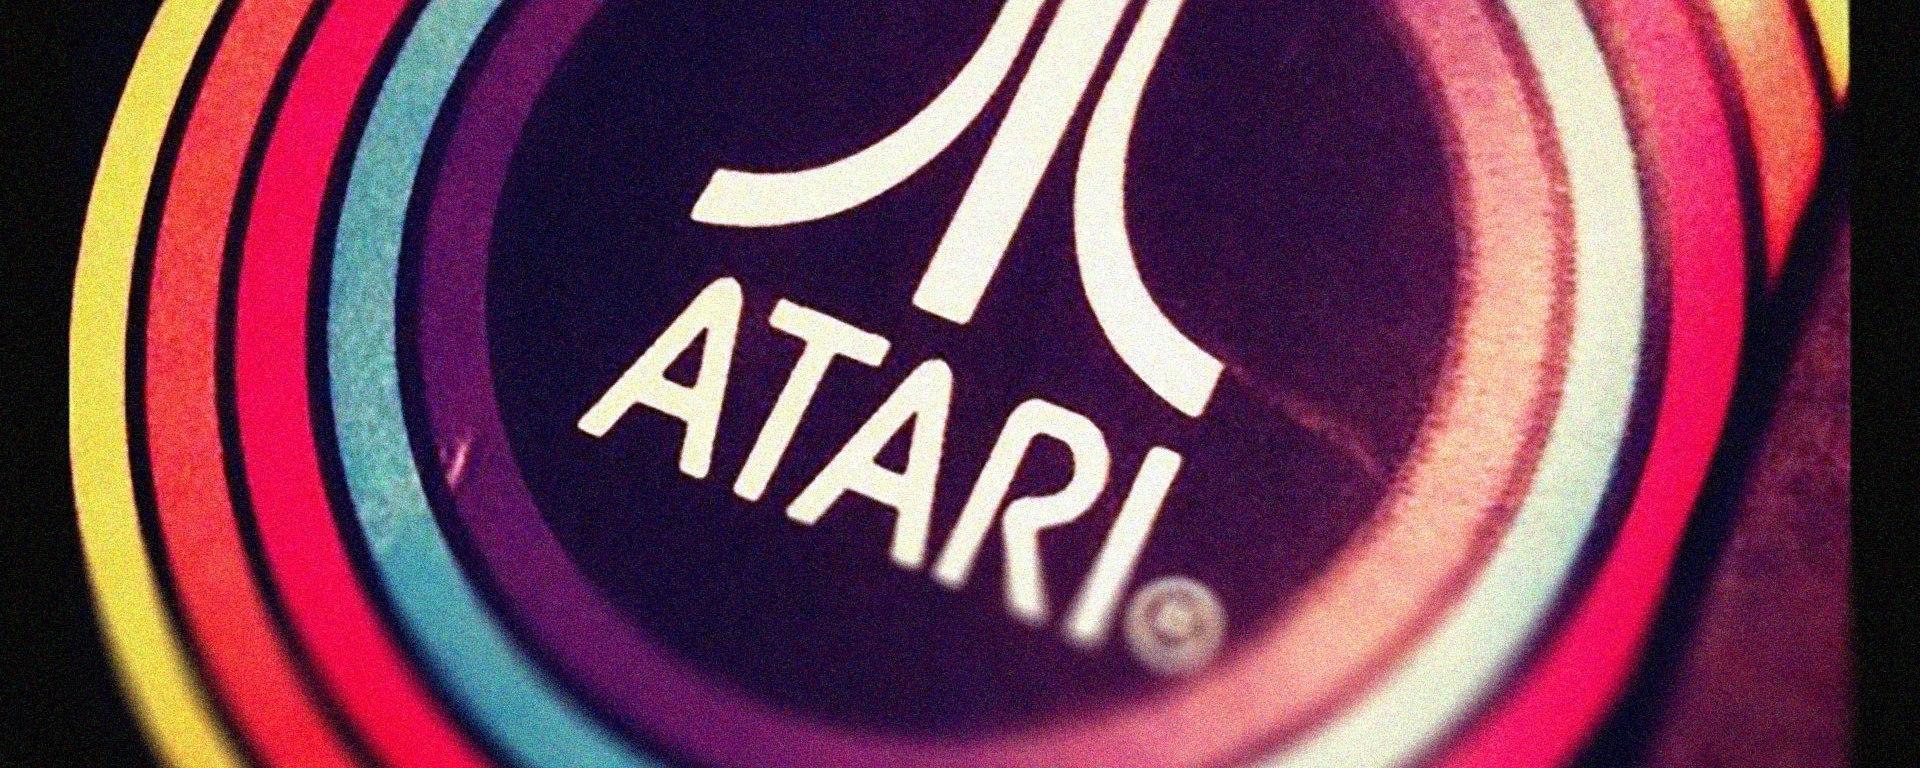 A história por trás do logo da Atari